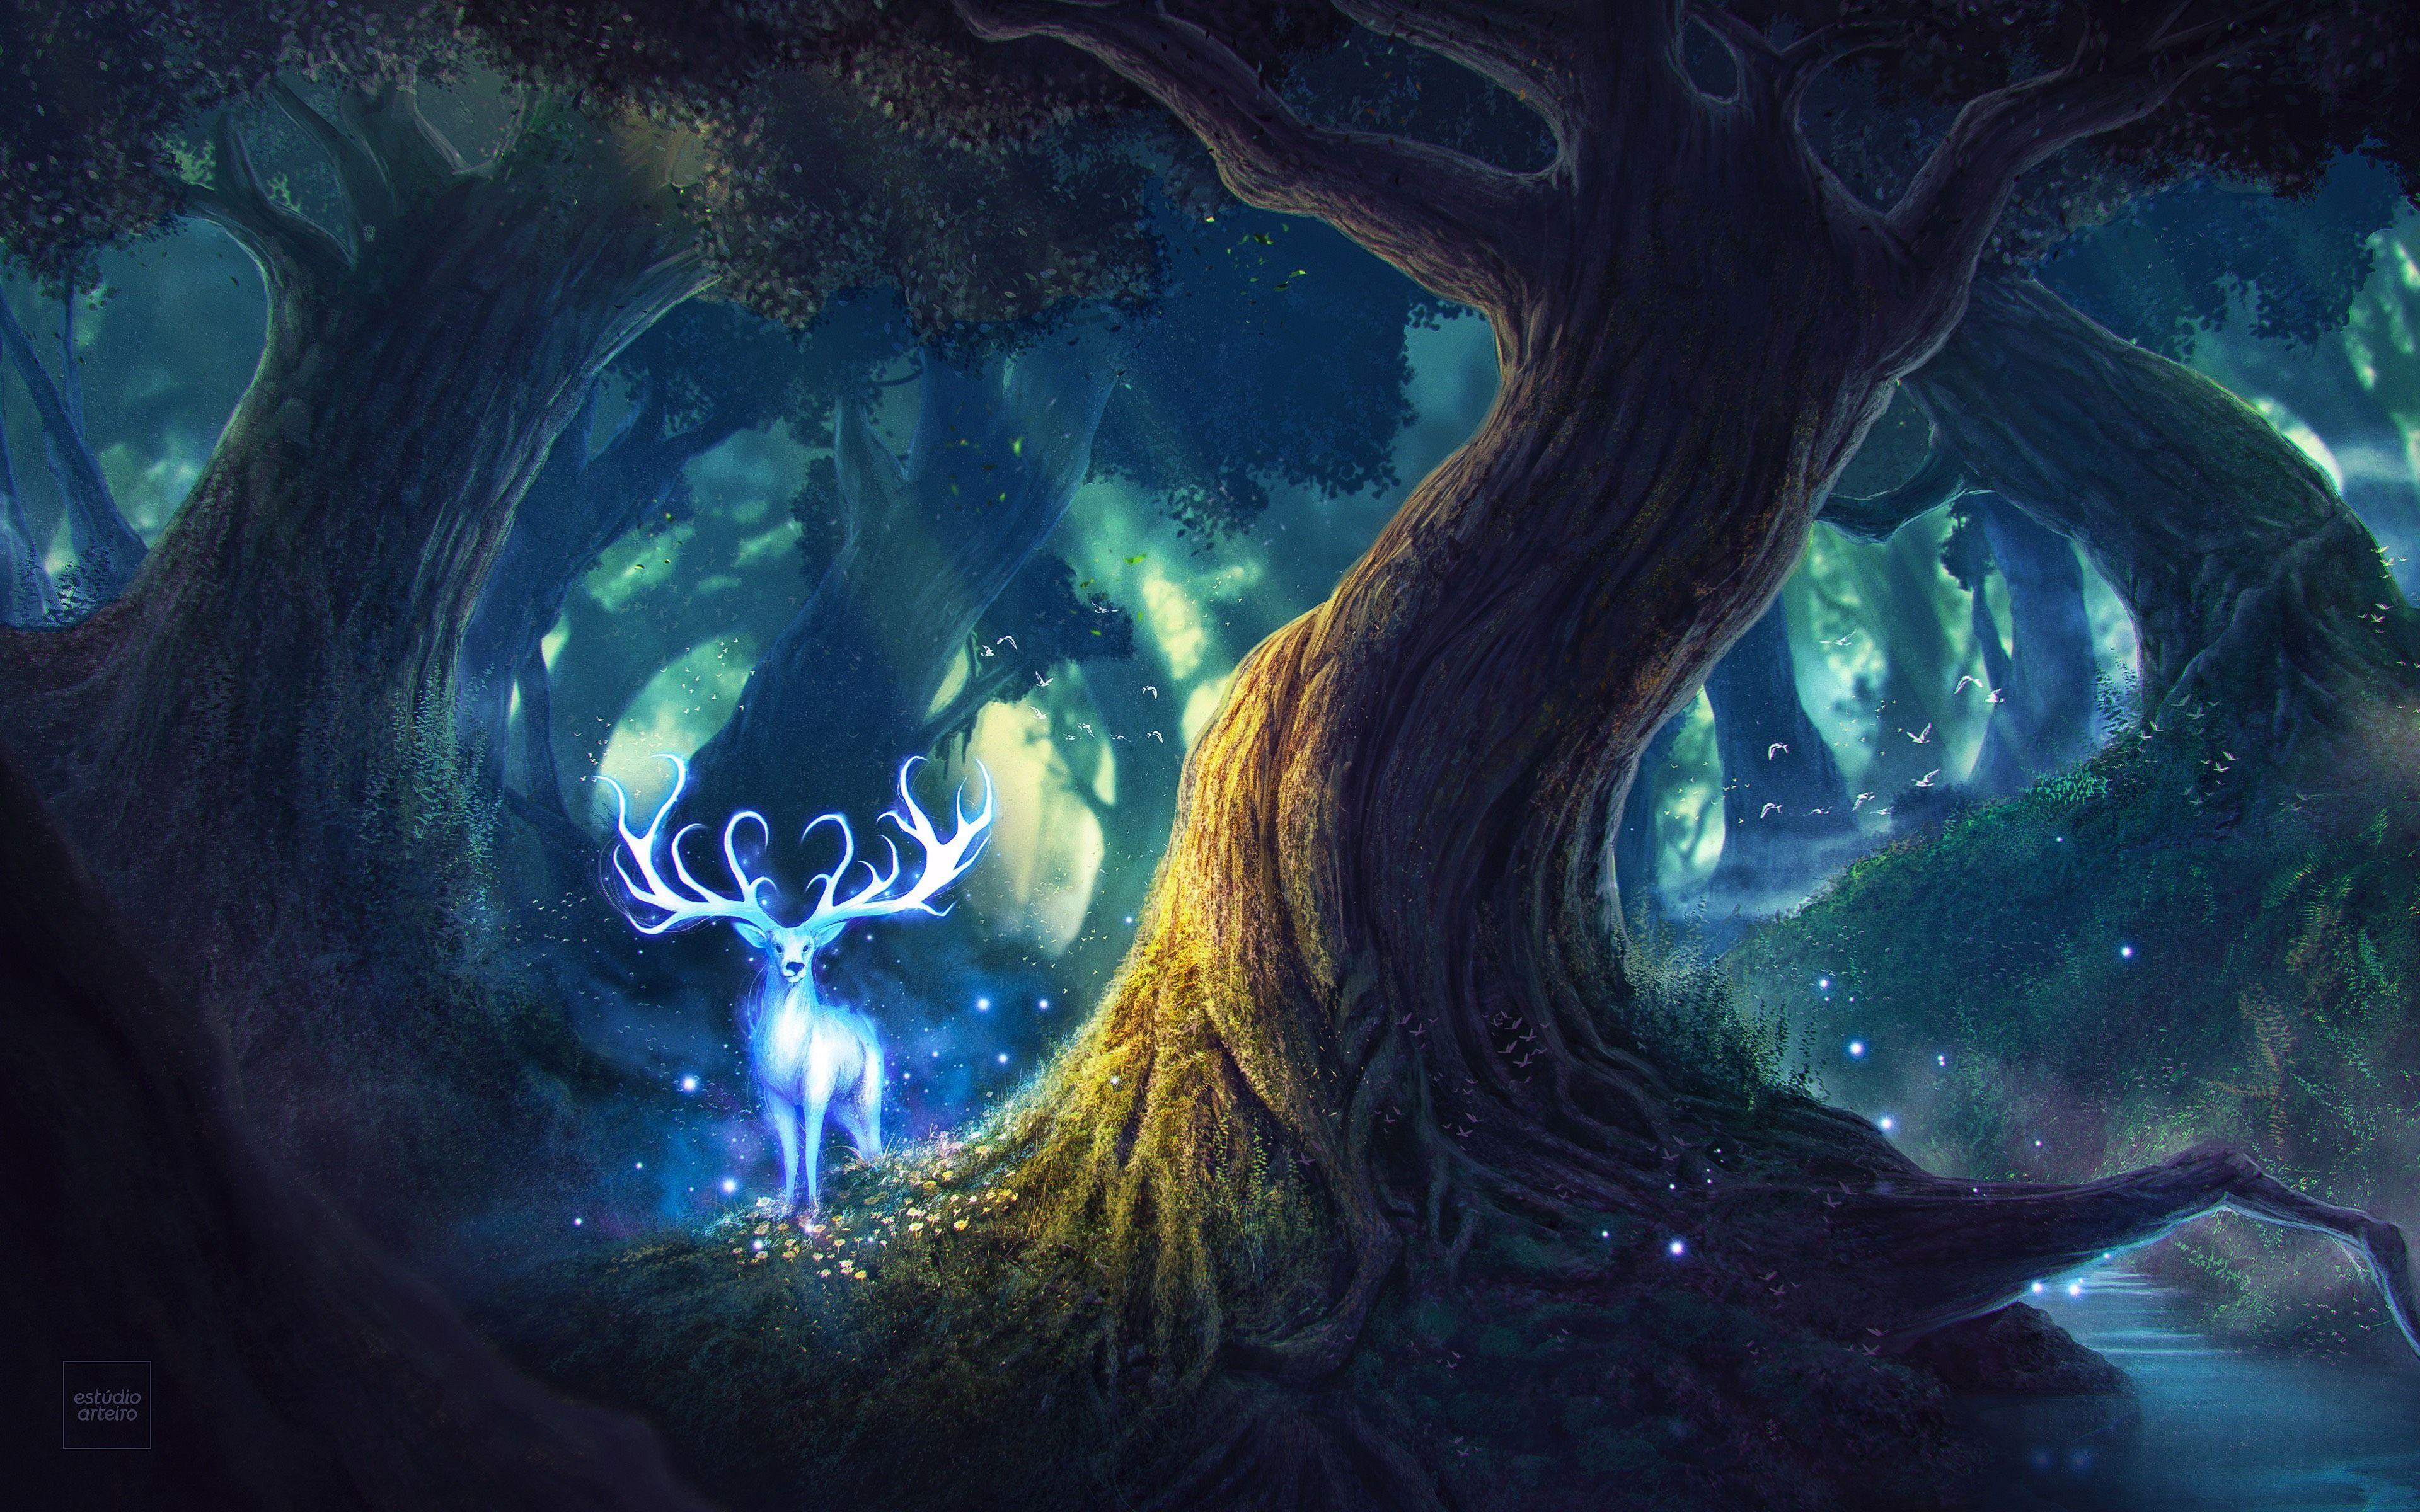 Hd Spirit Wallpapers Top Free Hd Spirit Backgrounds